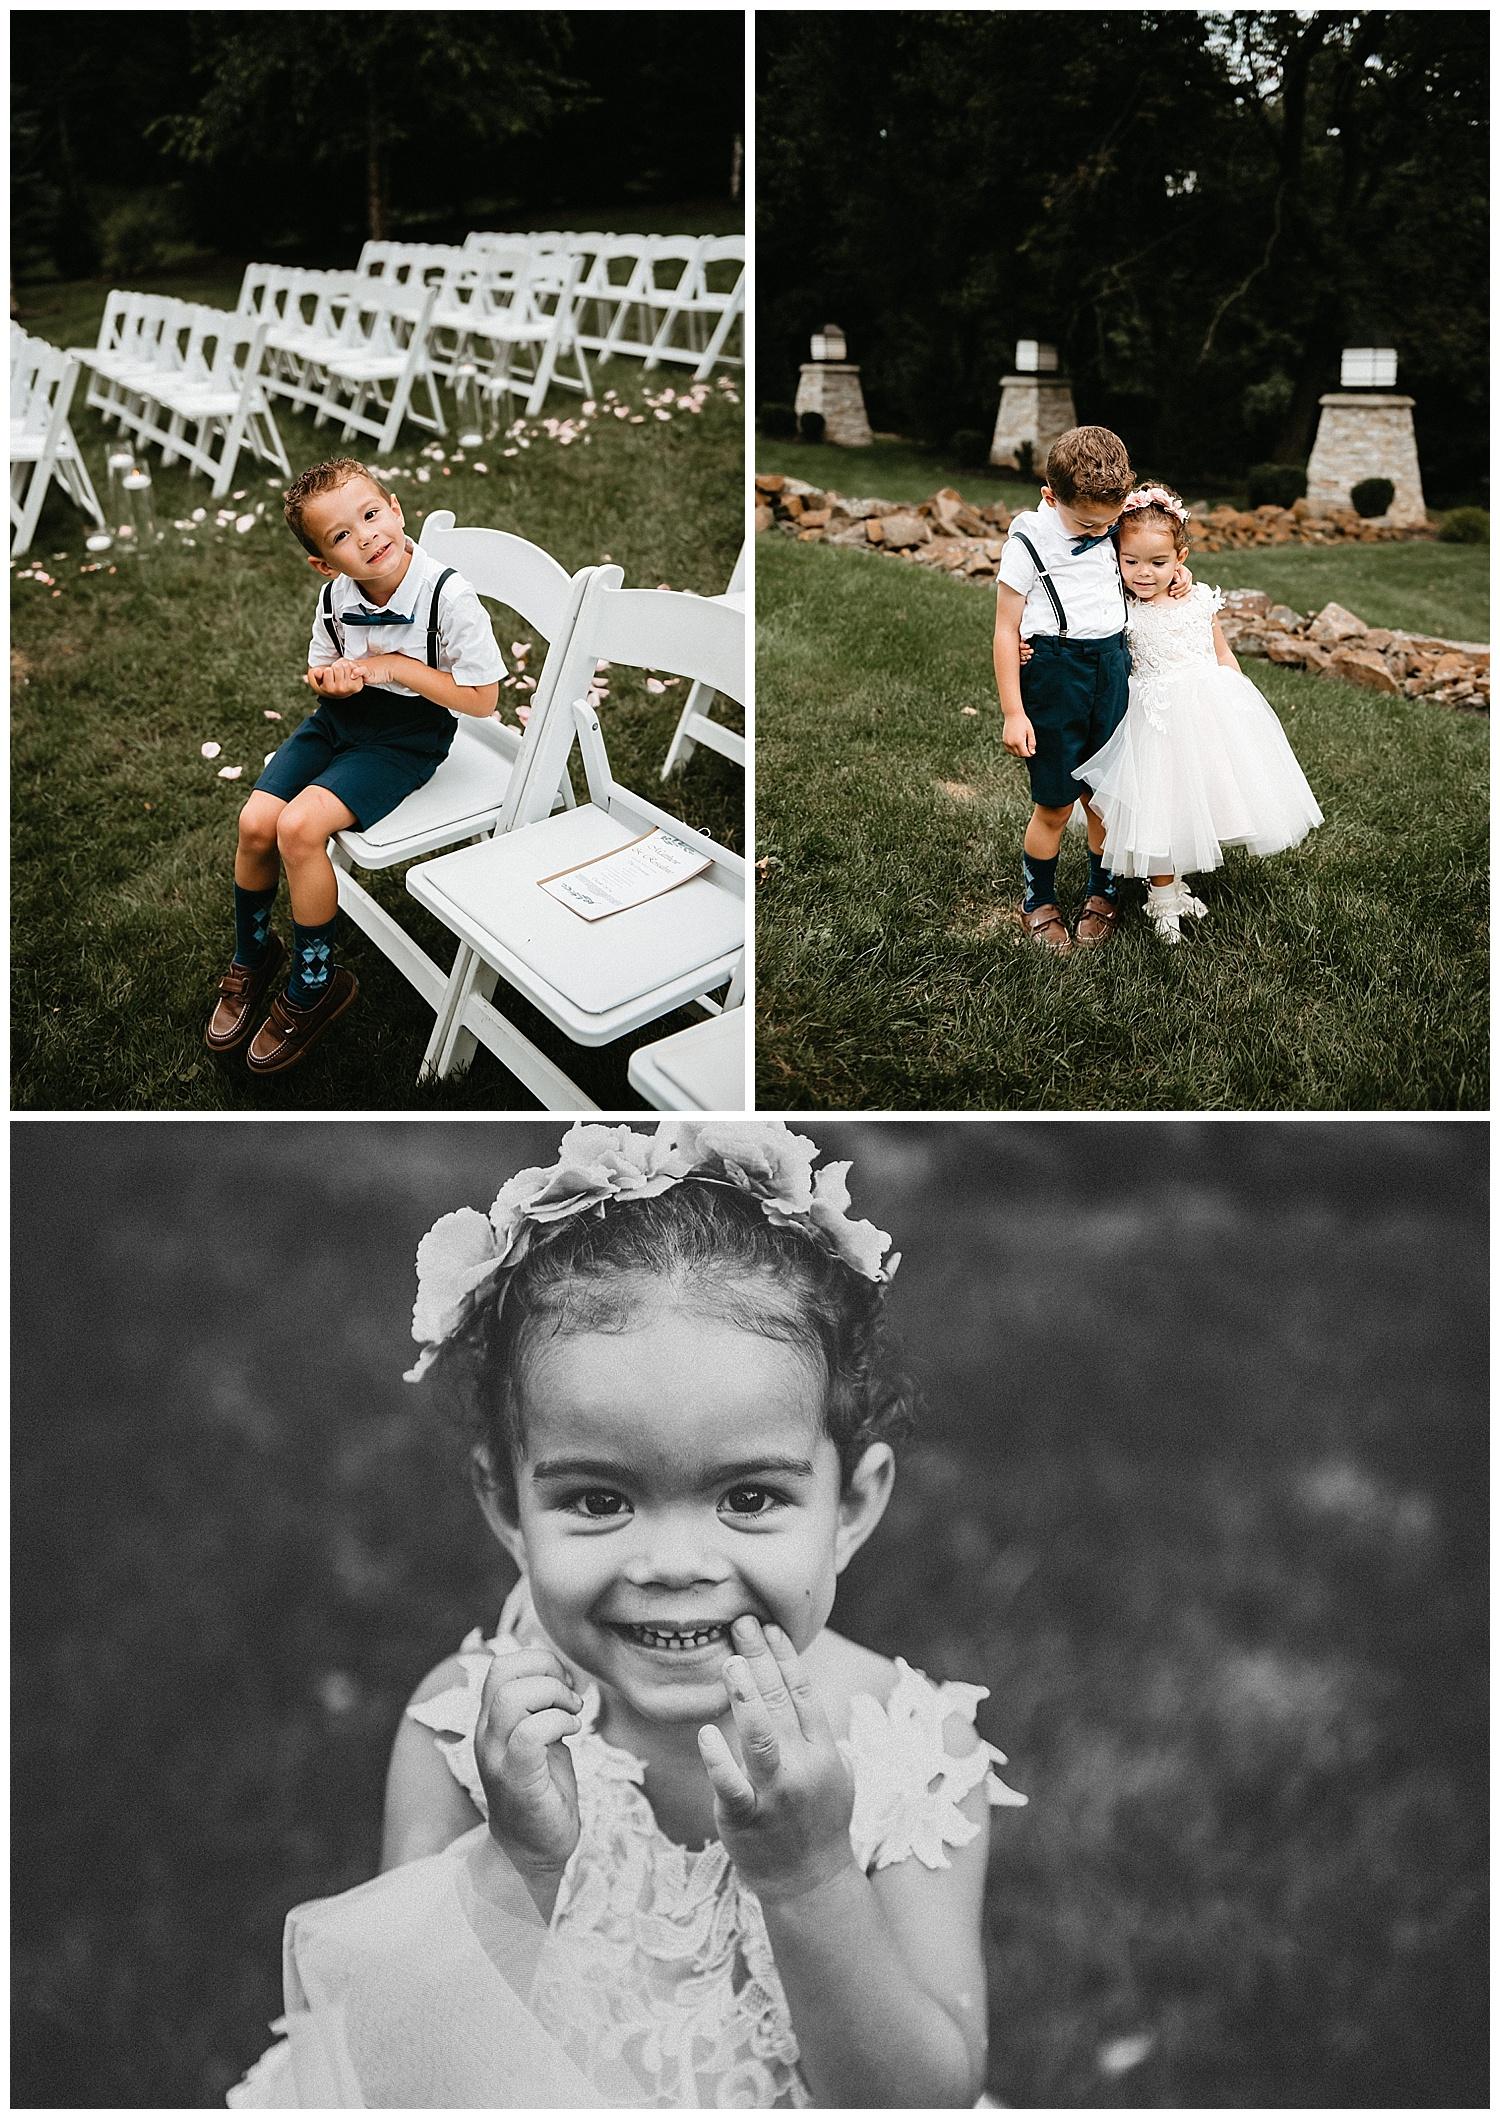 New-Jersey-wedding-photographer-at-Stone-House-at-stirling-ridge-Warren-NJ_0038.jpg